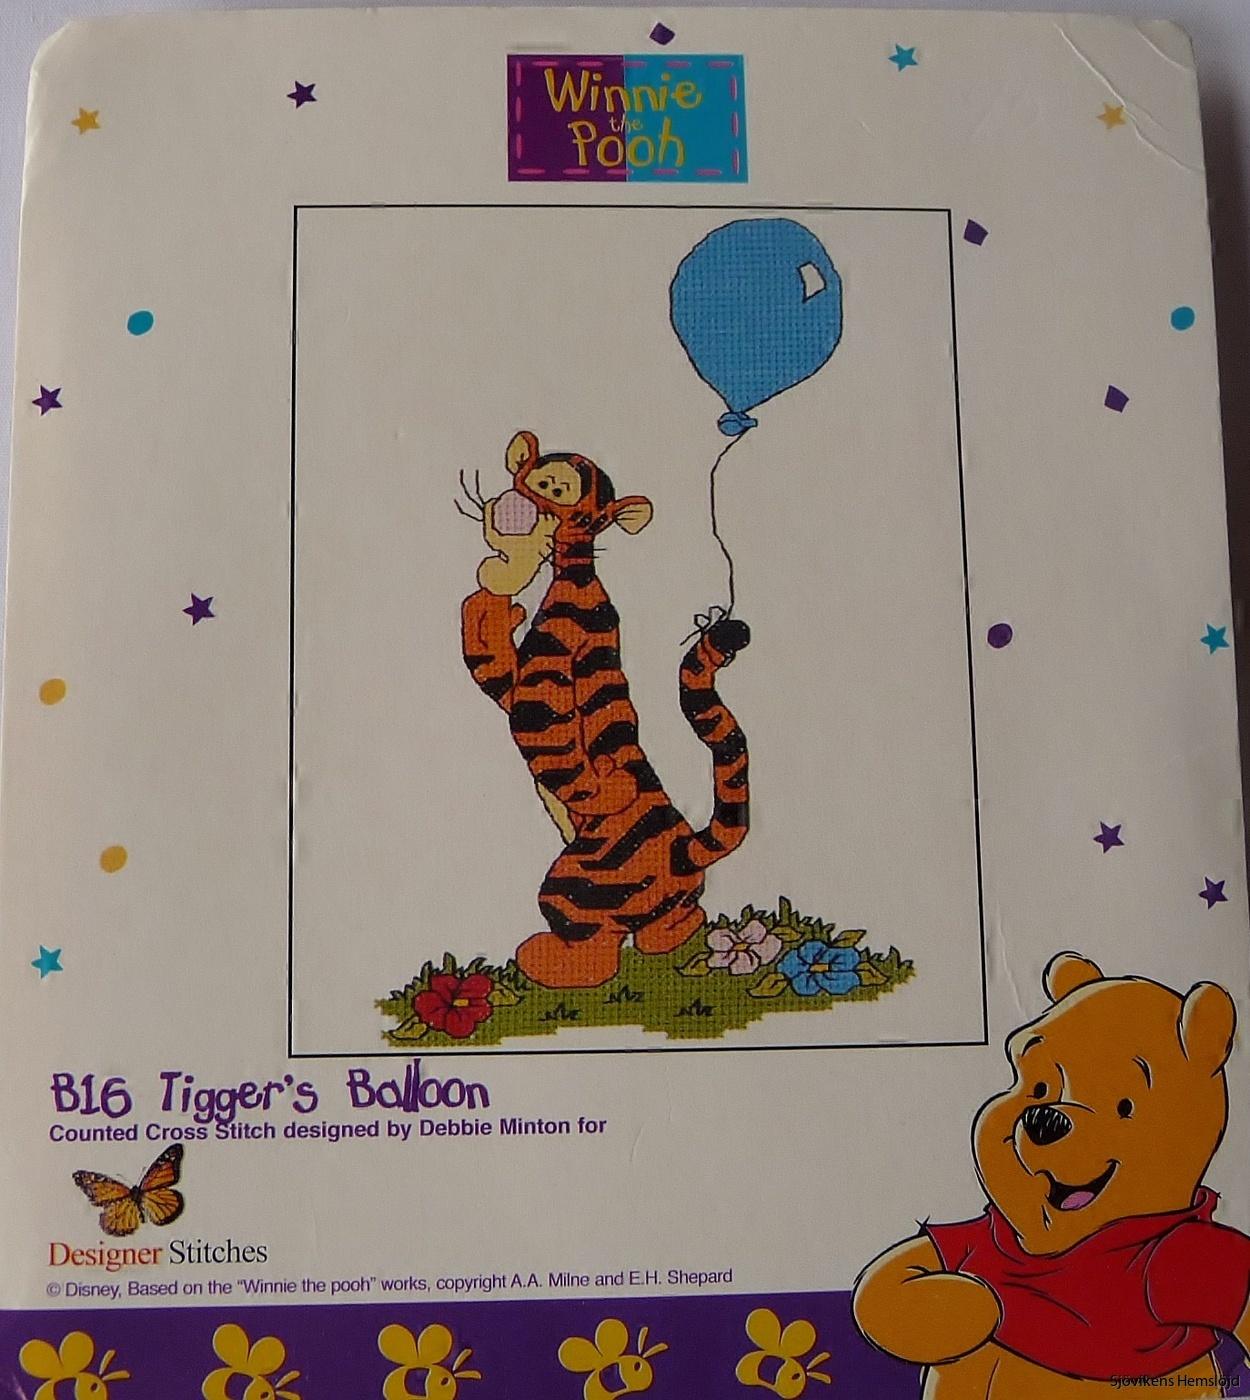 B16 Tiggers balloon 1